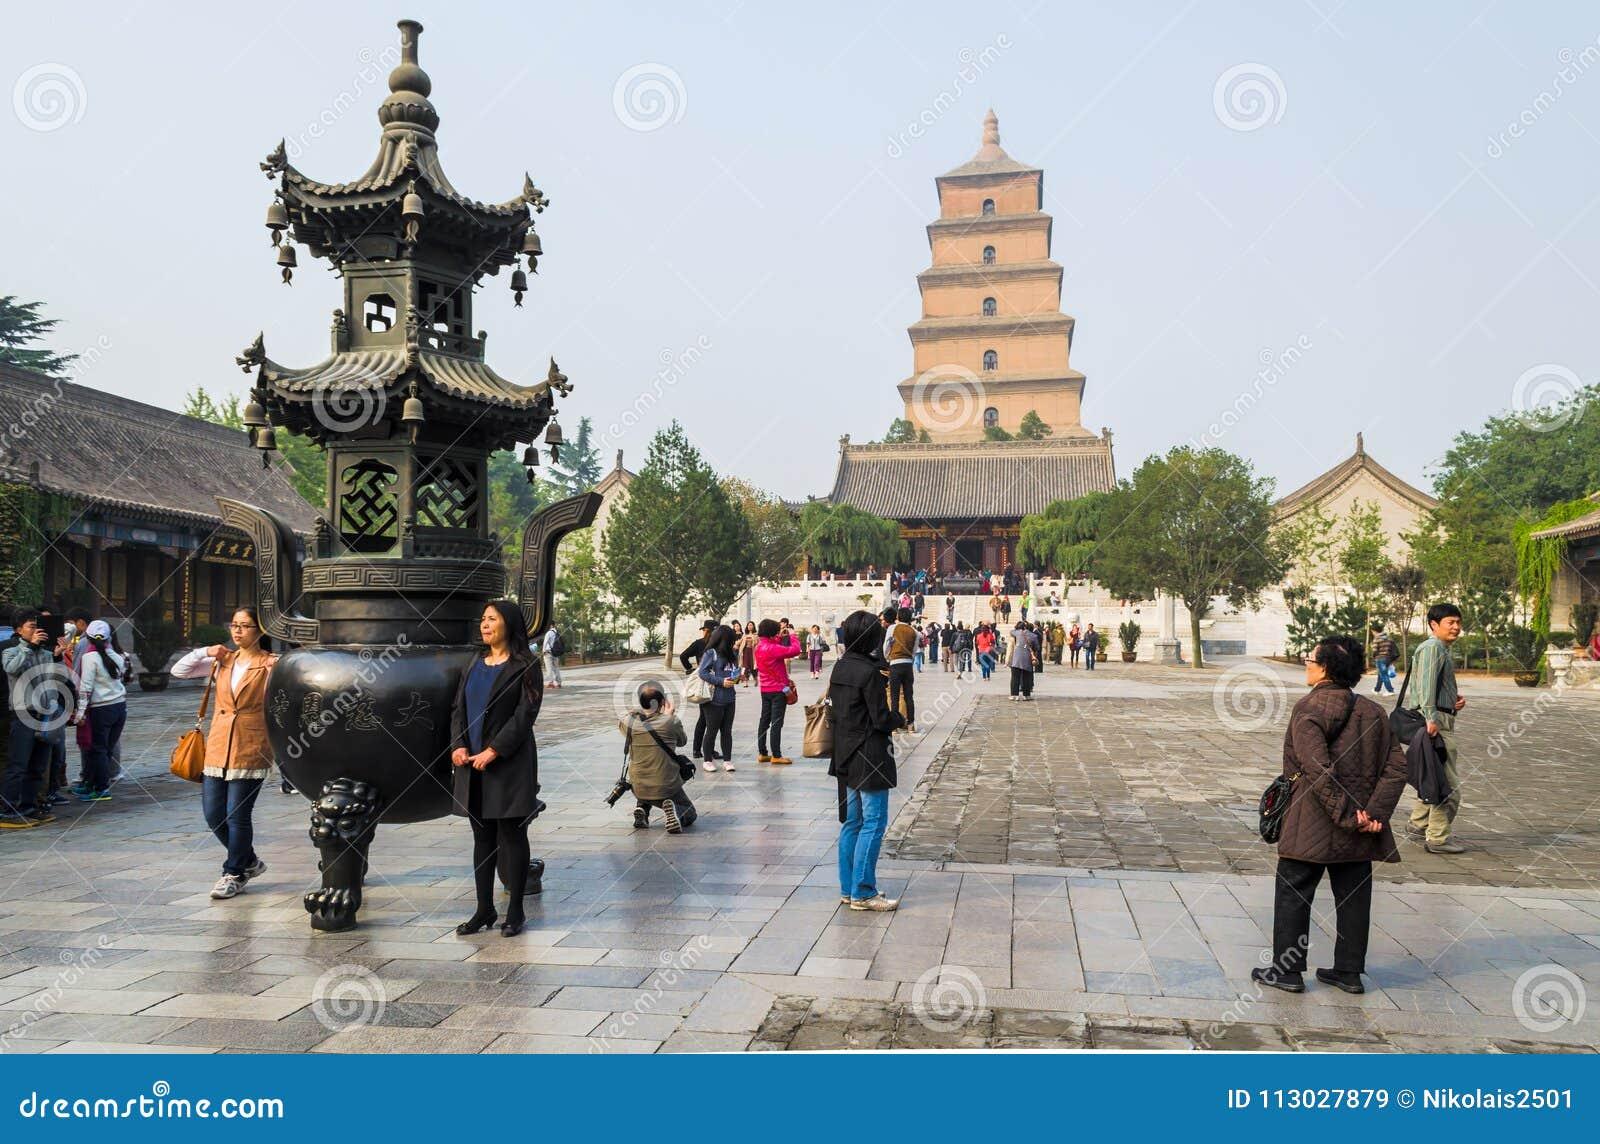 XIAN, CHINA - 17 de octubre de 2013: Pagoda salvaje gigante del ganso, provincia de Xian, Shaanxi, China